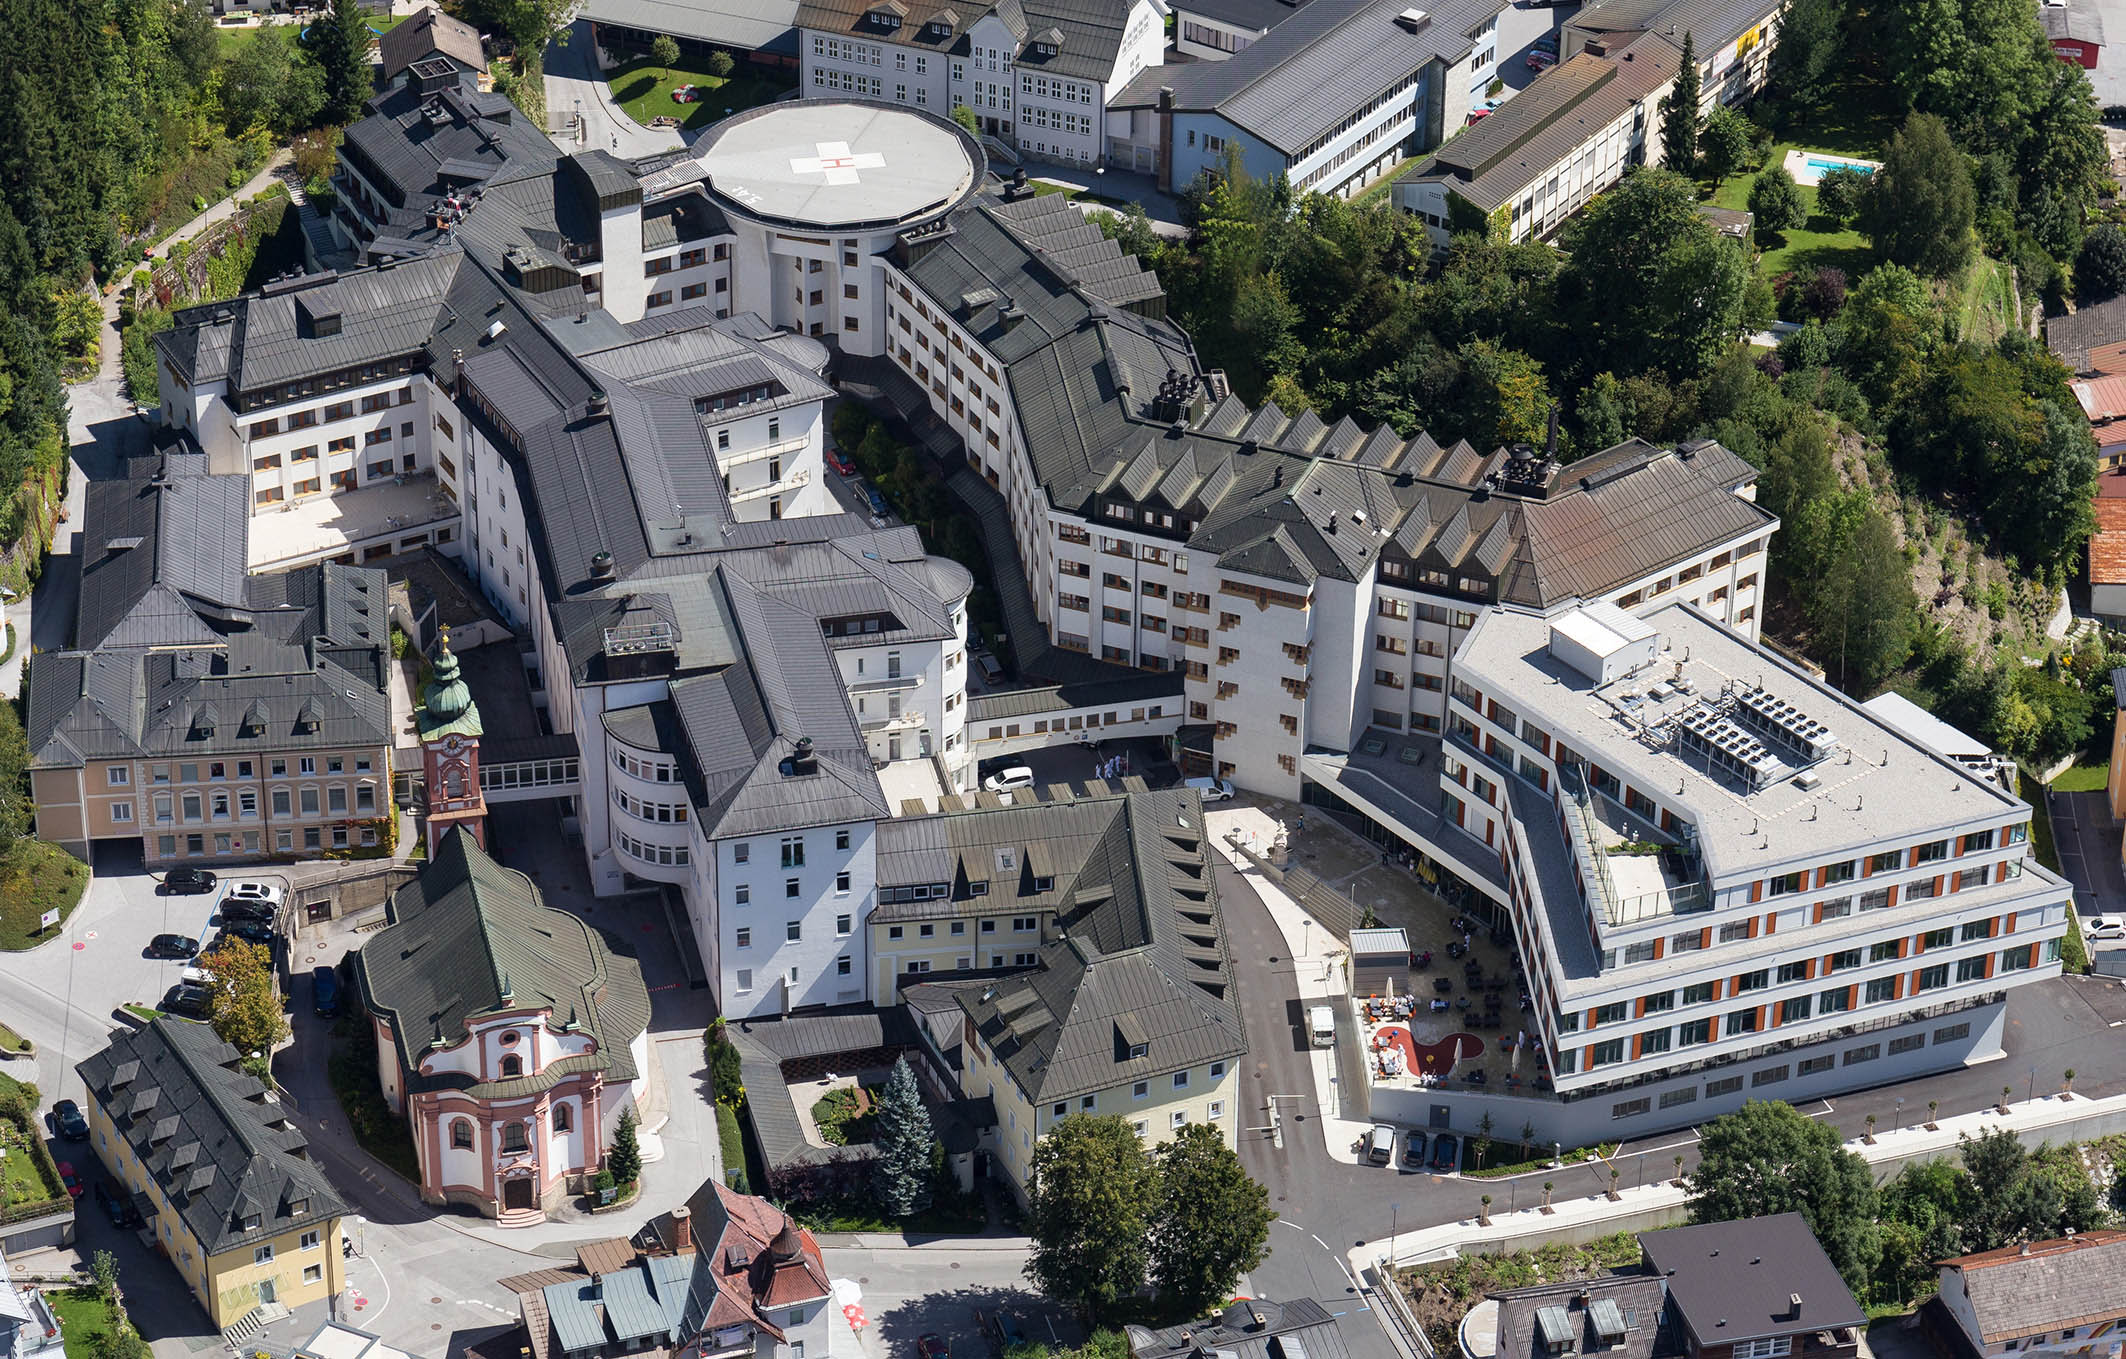 KS-Klinikum Schwarzach Luftbild